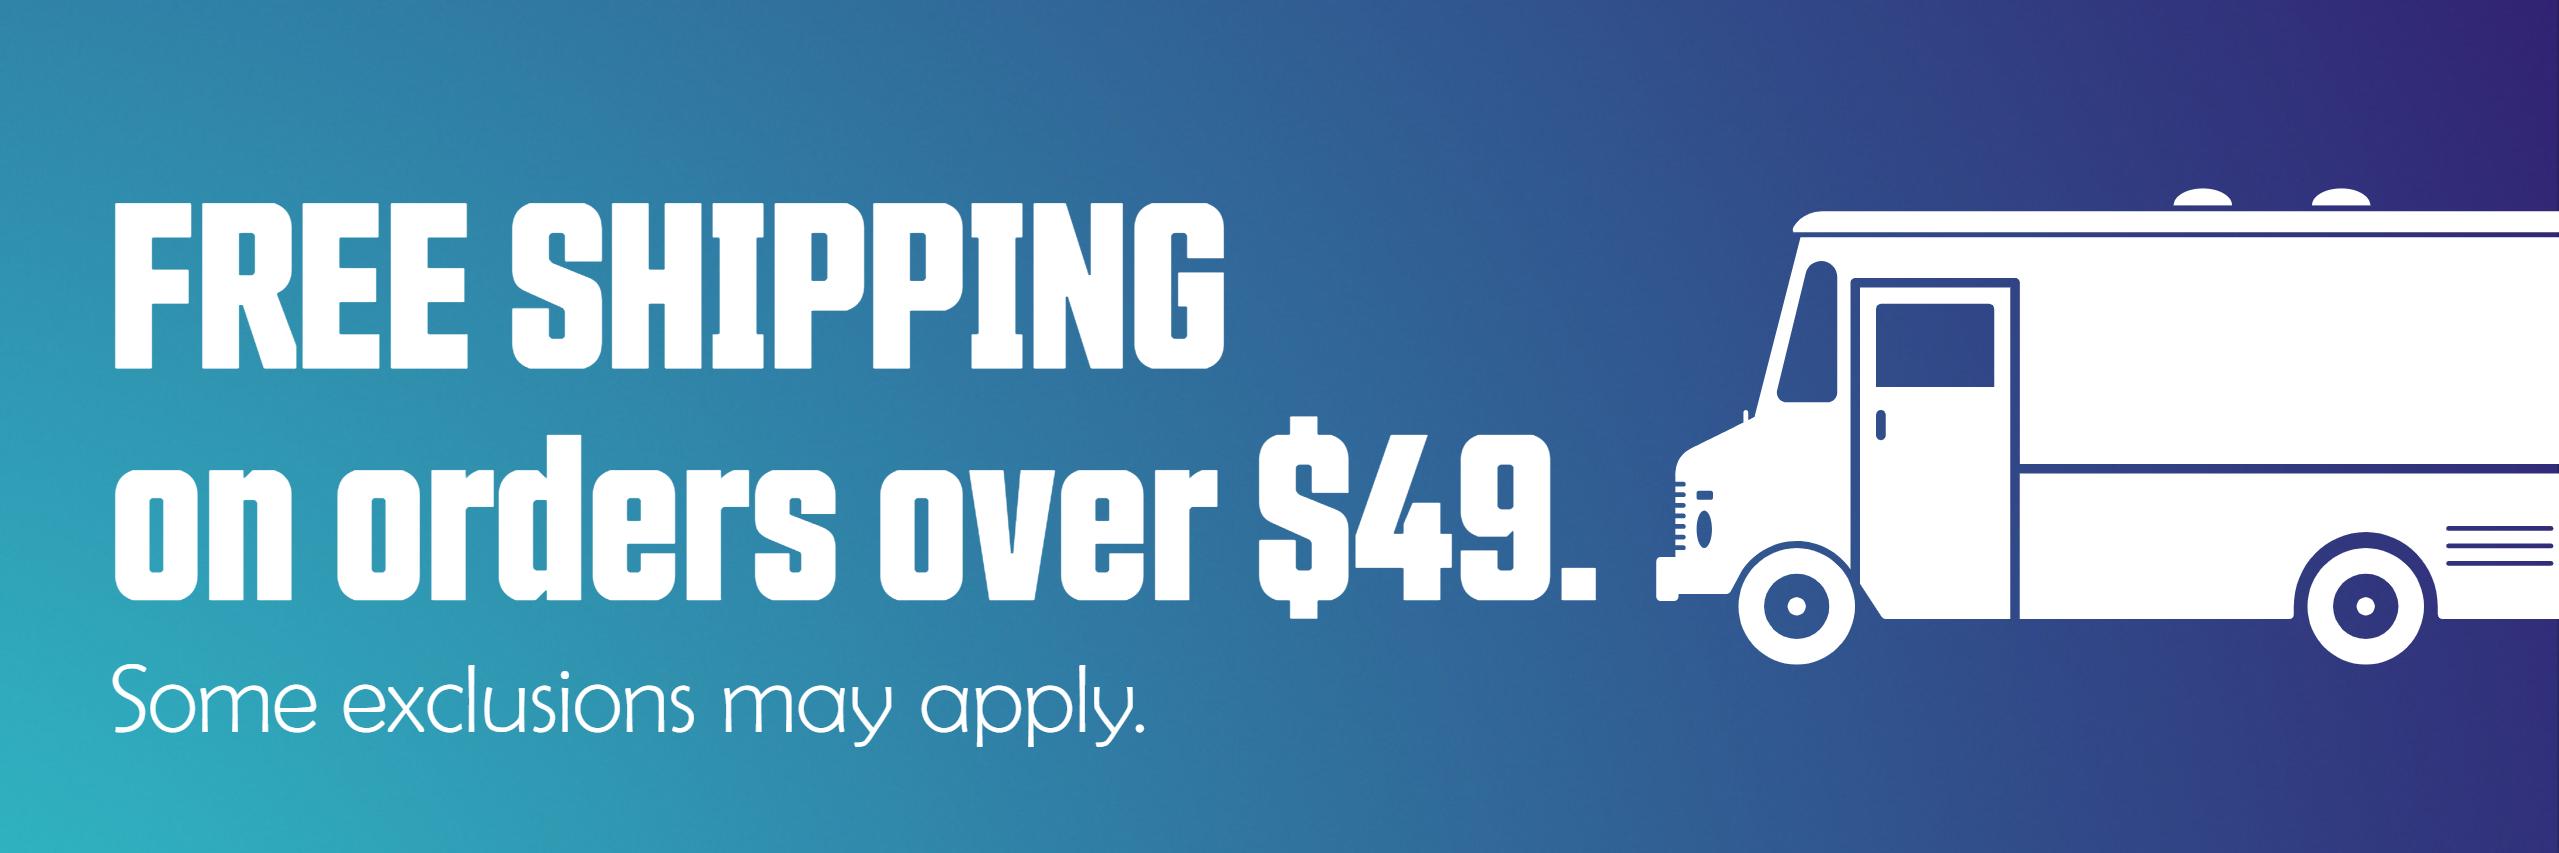 bc-free-shipping-banner-2.jpg